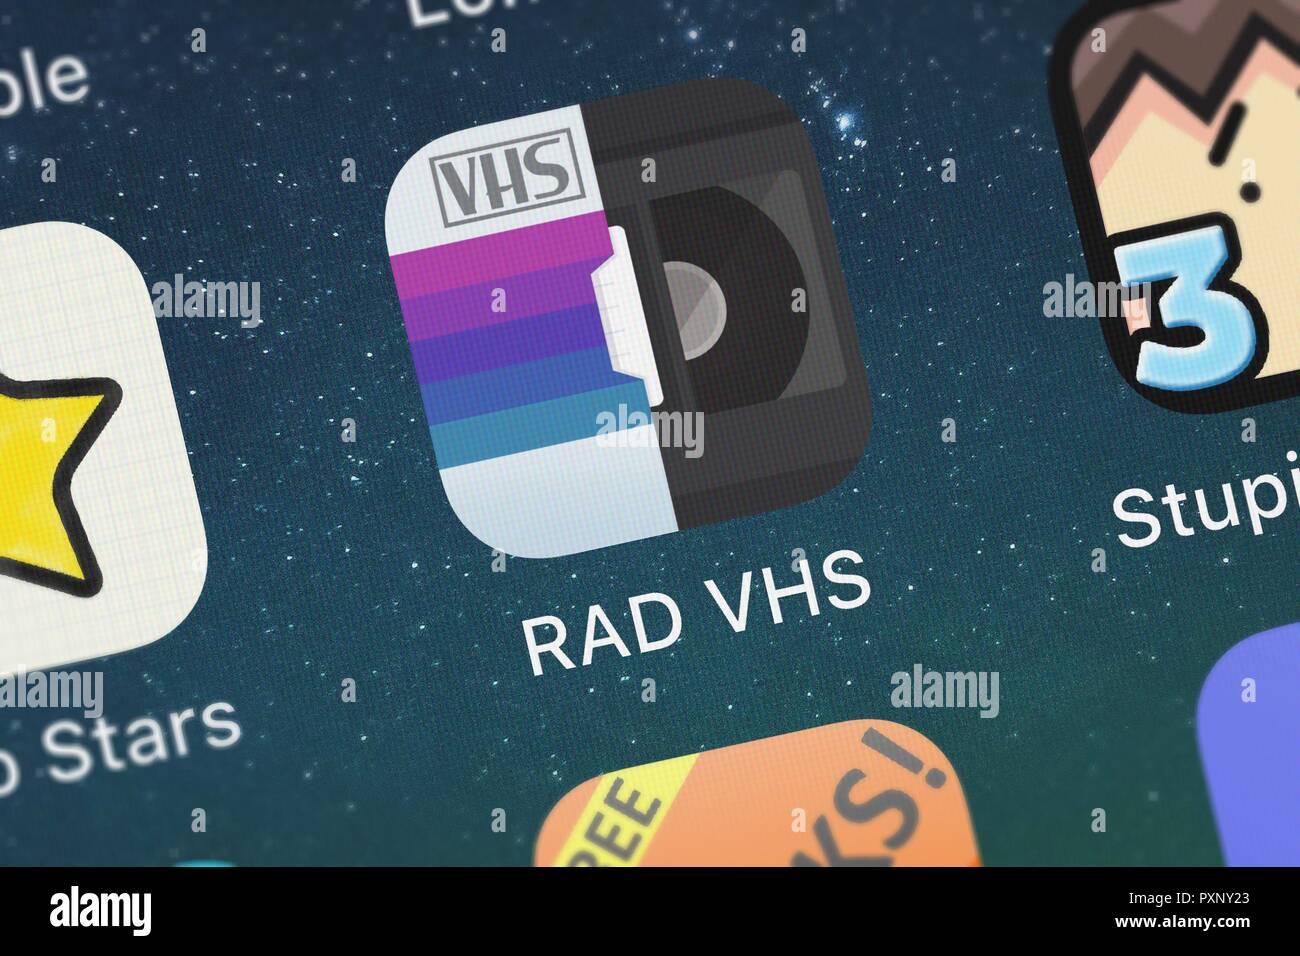 Vhs Photo App